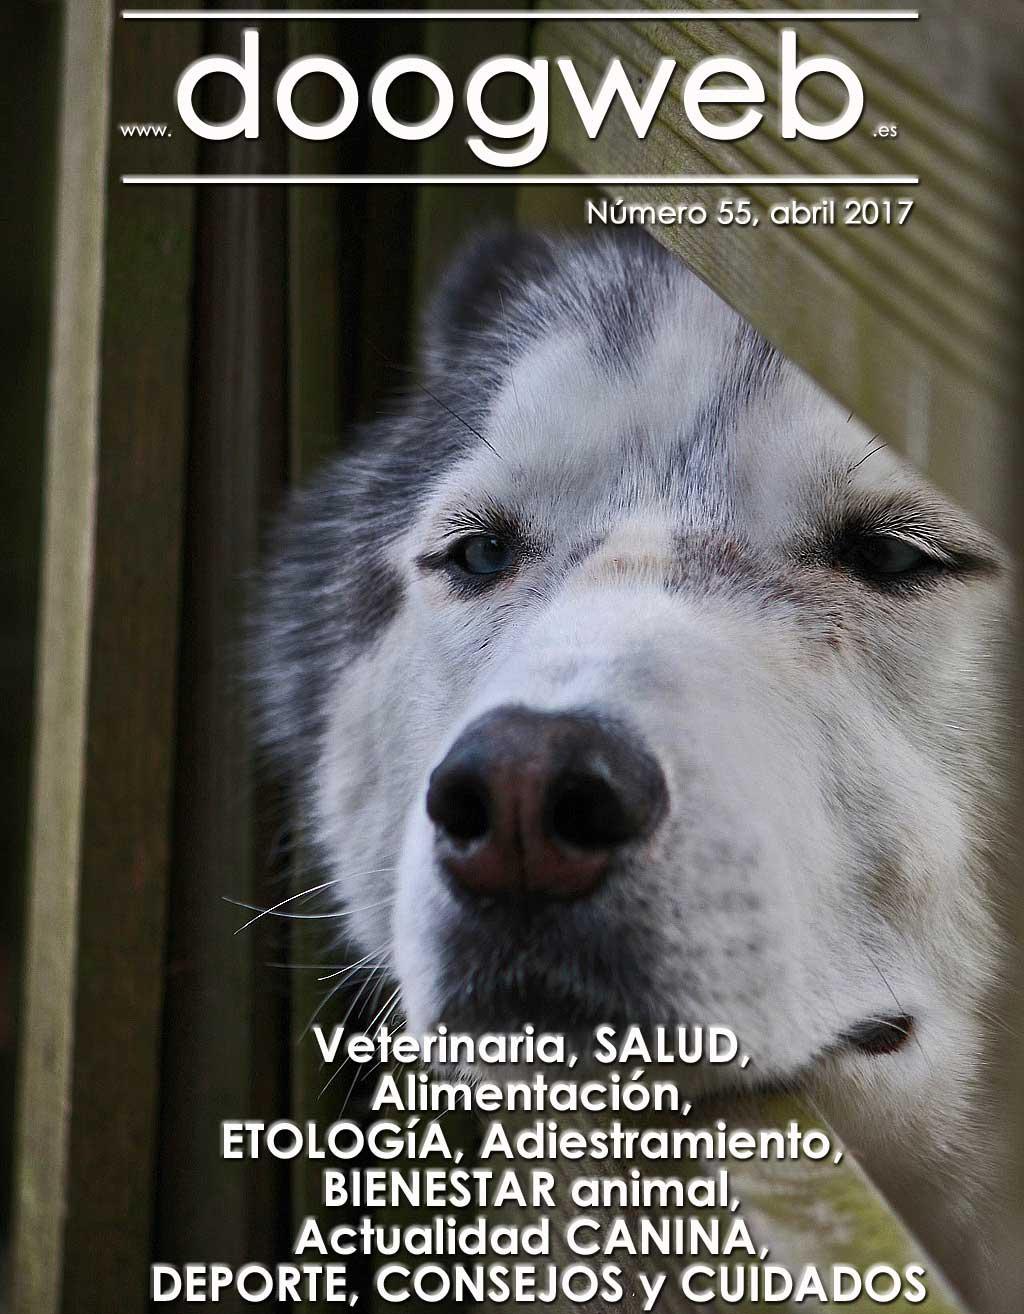 Revista de perros gratis de Doogweb.